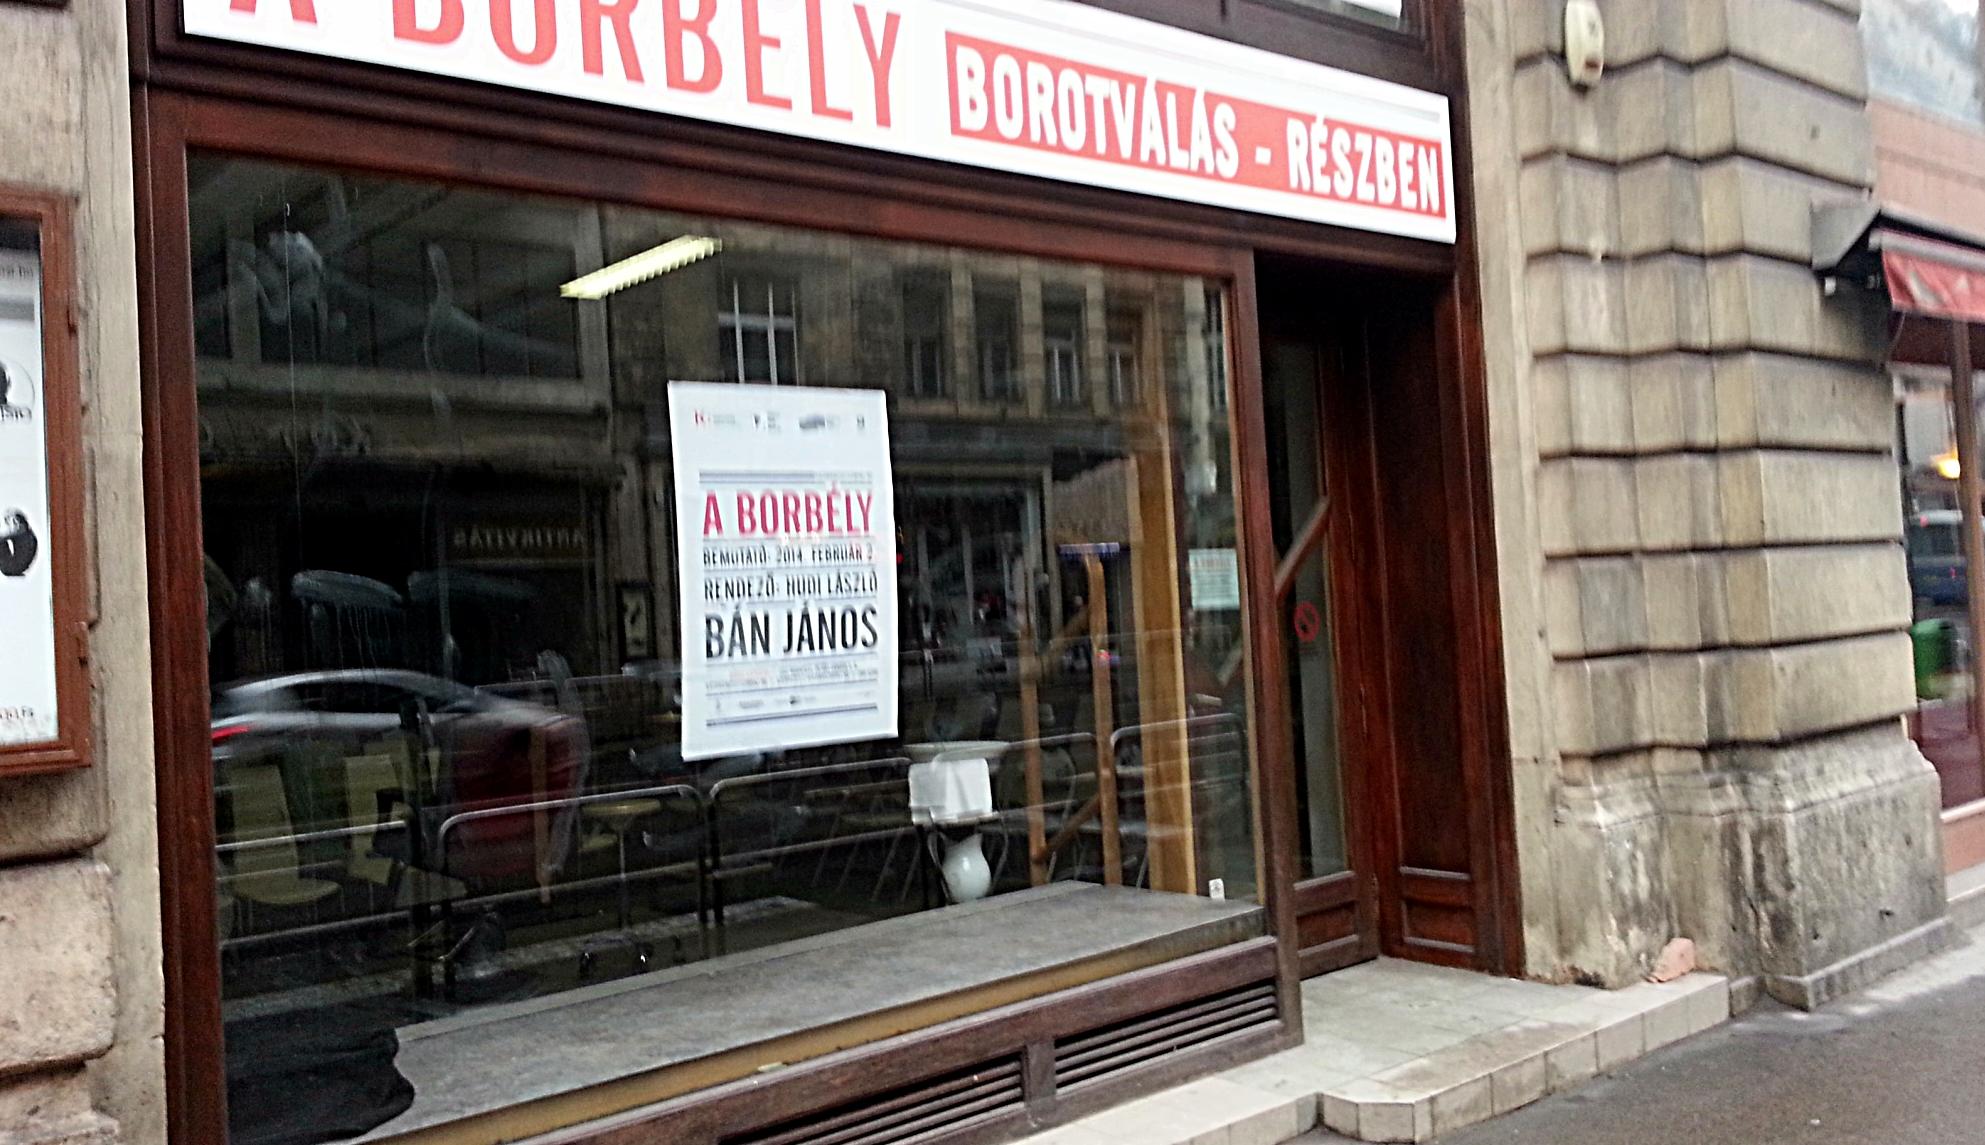 9dc04be18c File:A borbély című darab egy Kossuth Lajos utcai üzletben.jpg ...